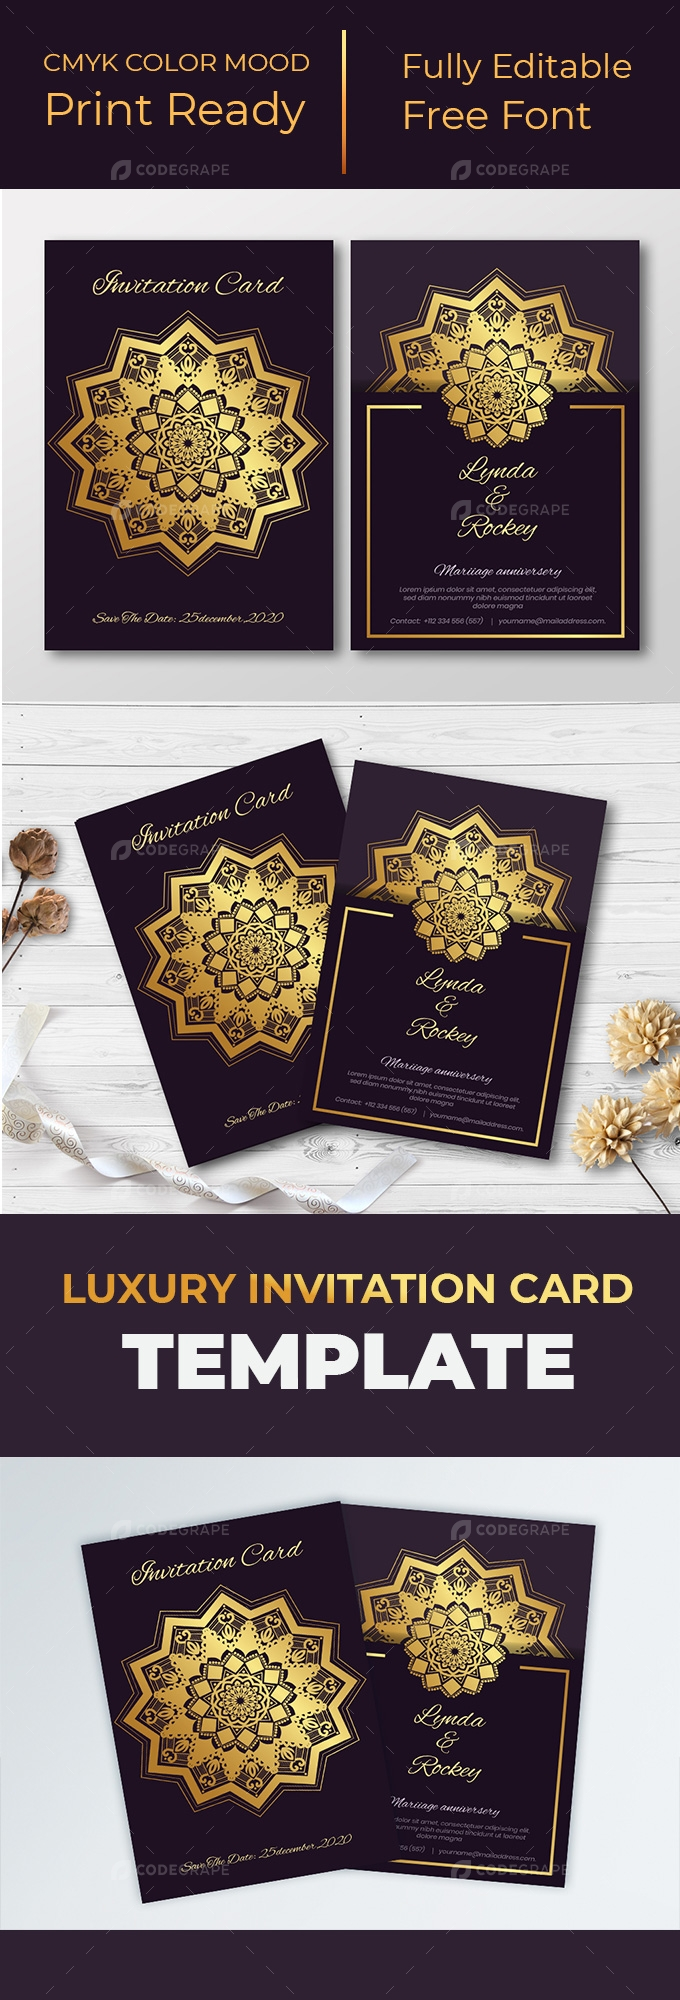 Luxury Invitation Card Design Template